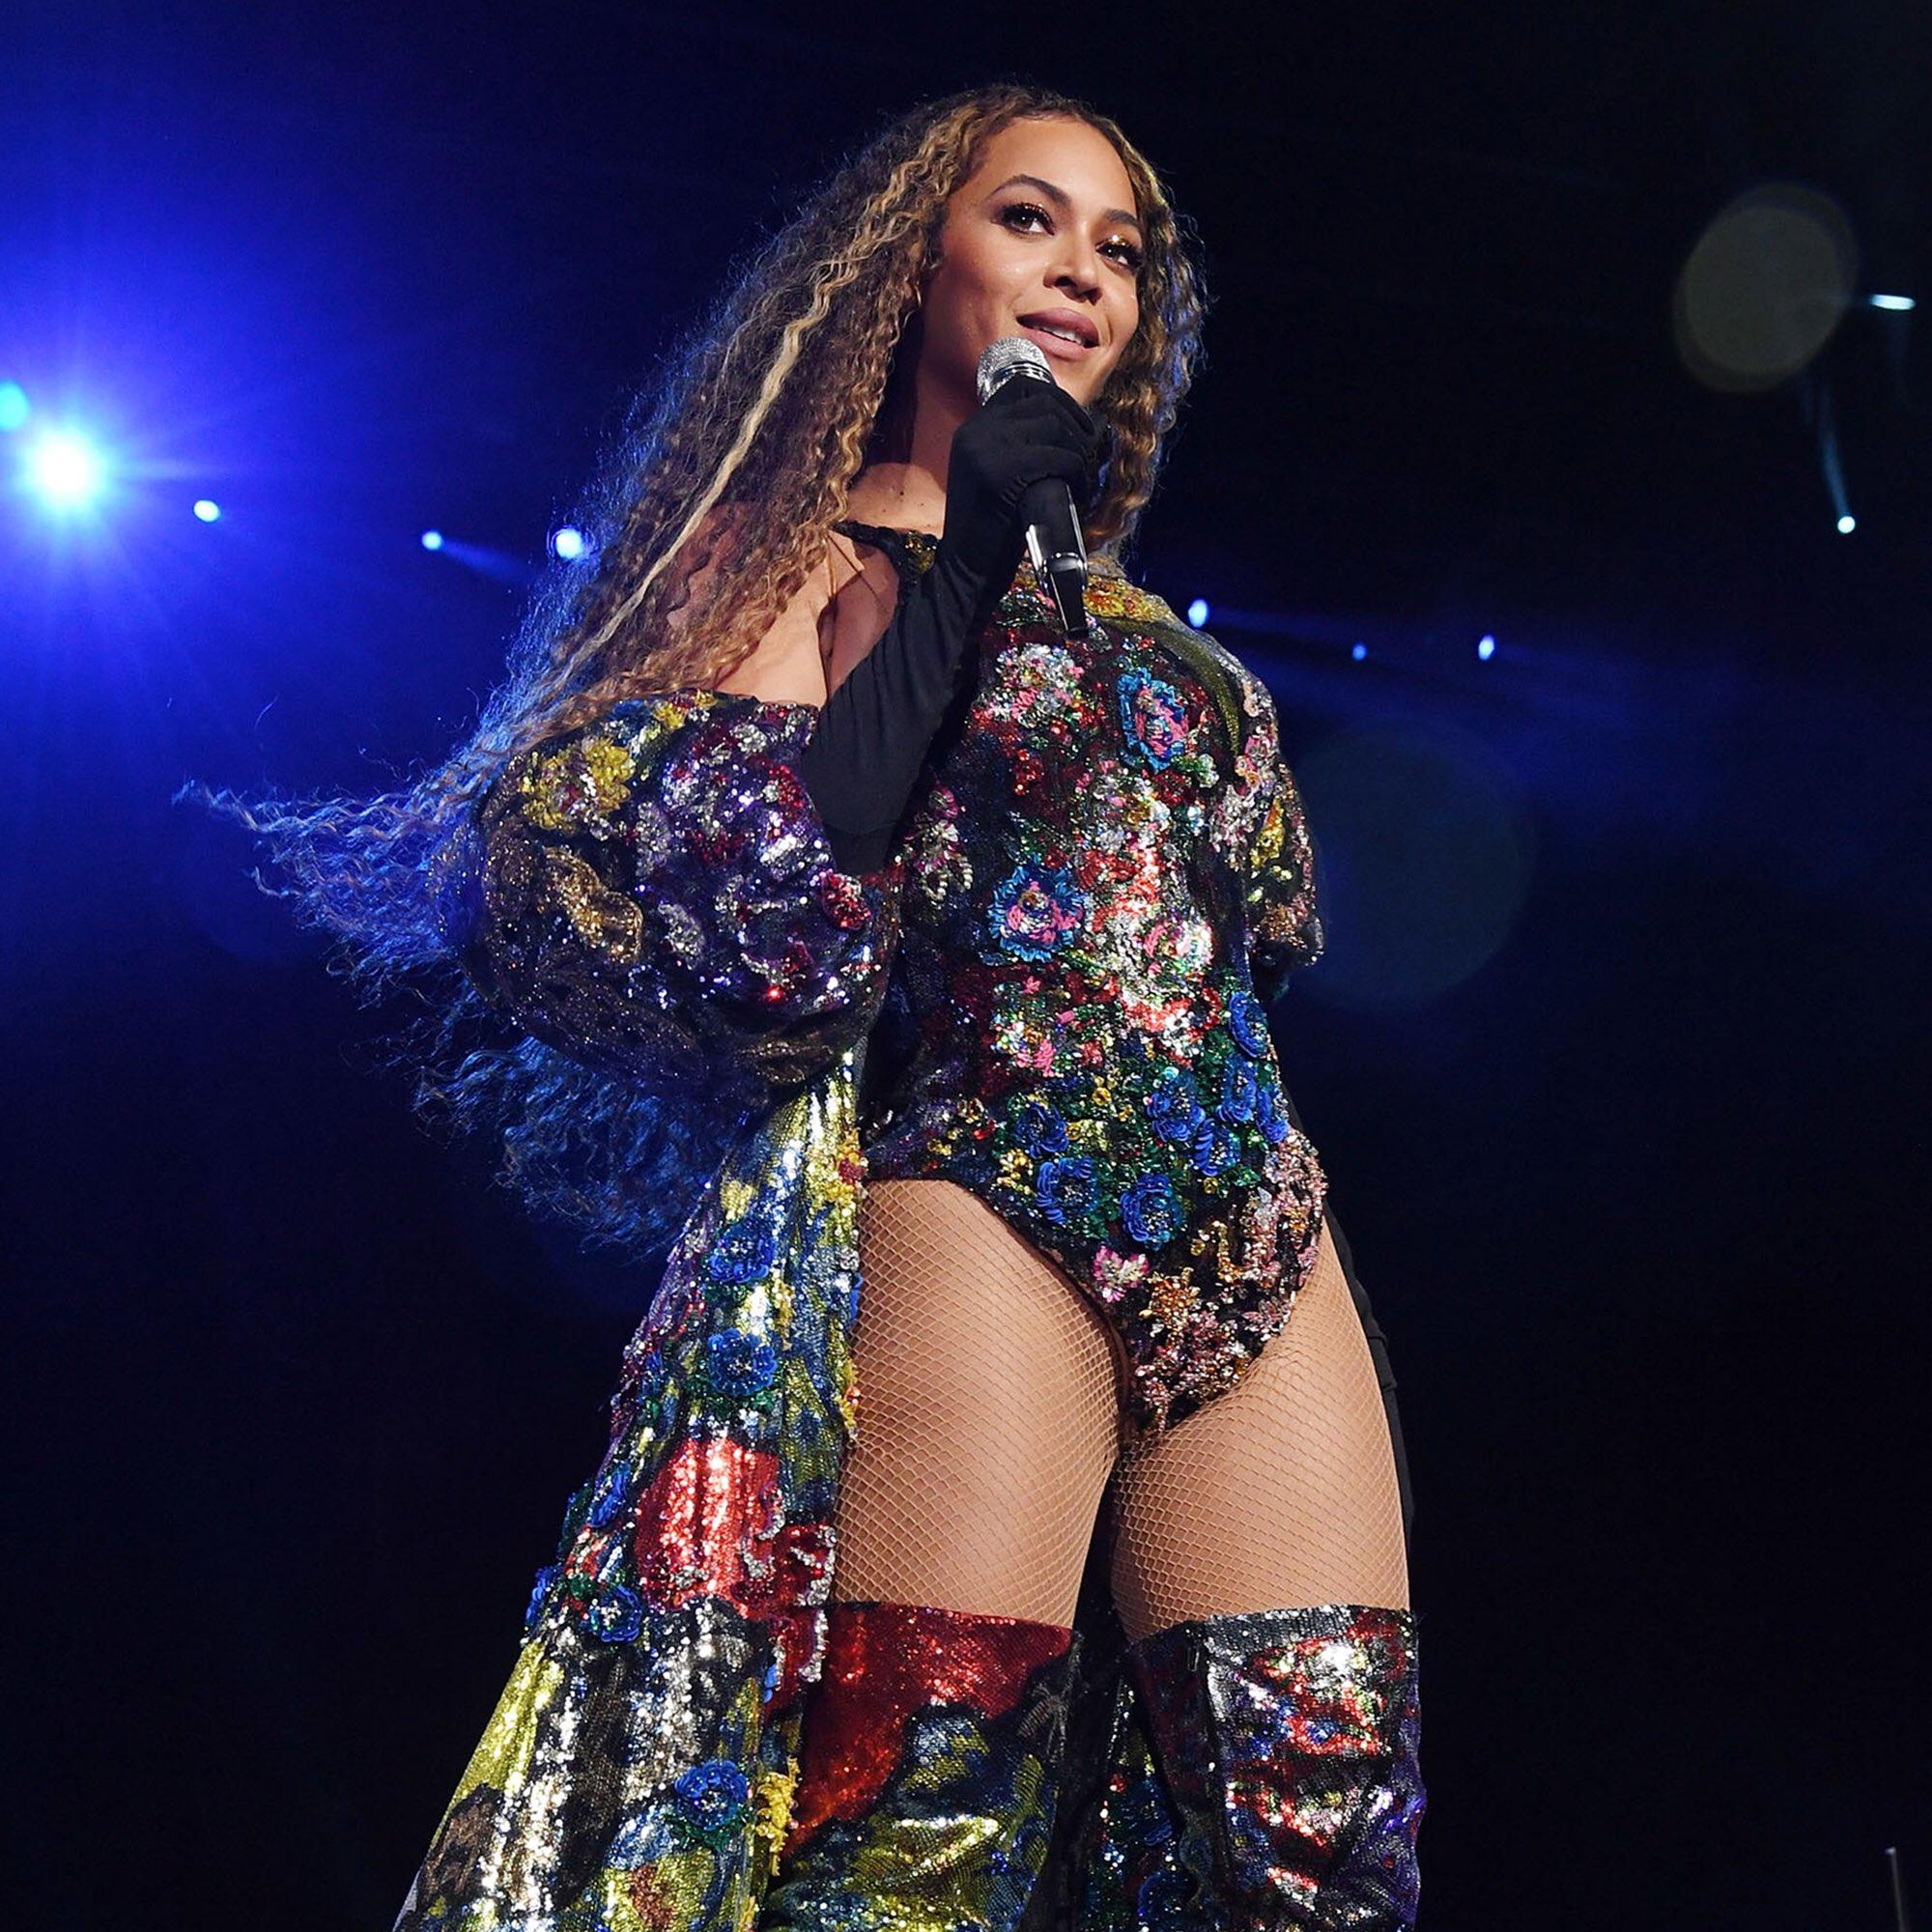 Happy 40th Birthday to Beyoncé.